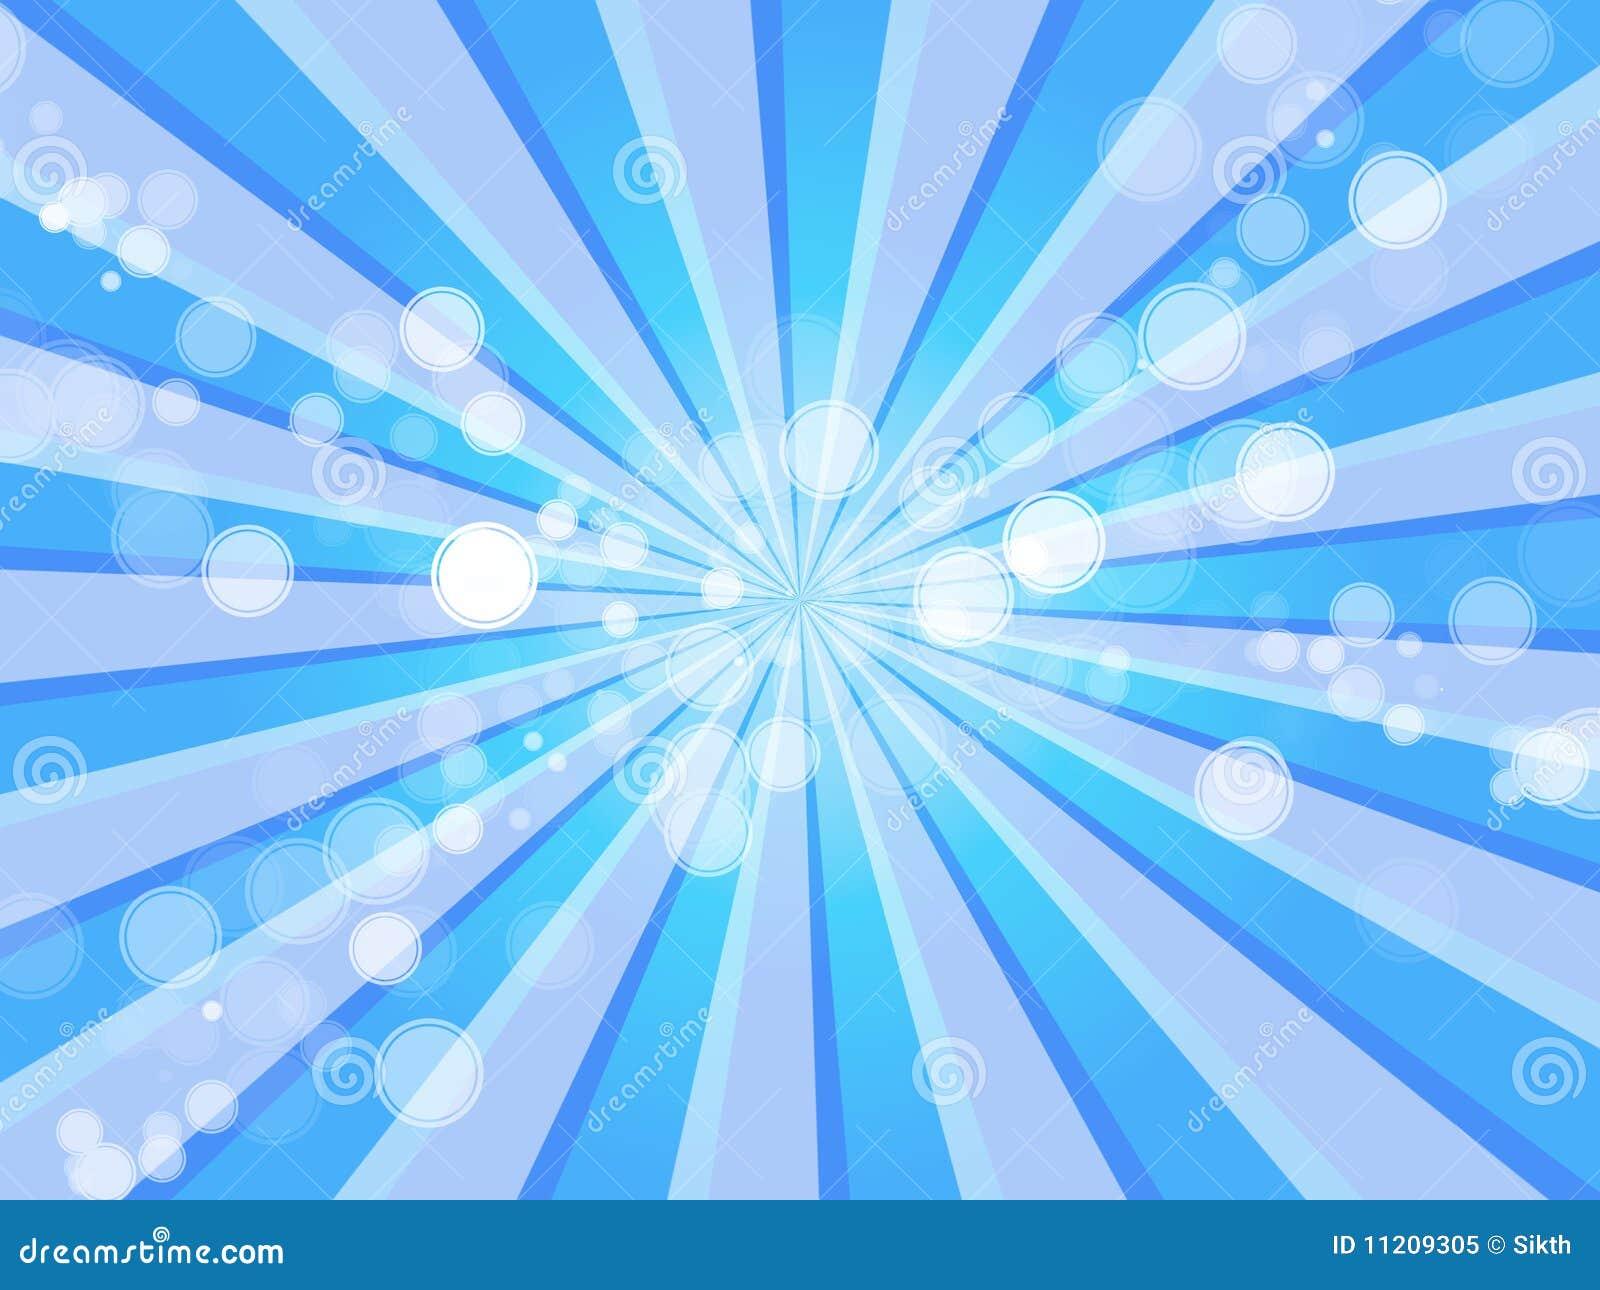 Blue Rays Blue Rays amp Oxygen Bubbles